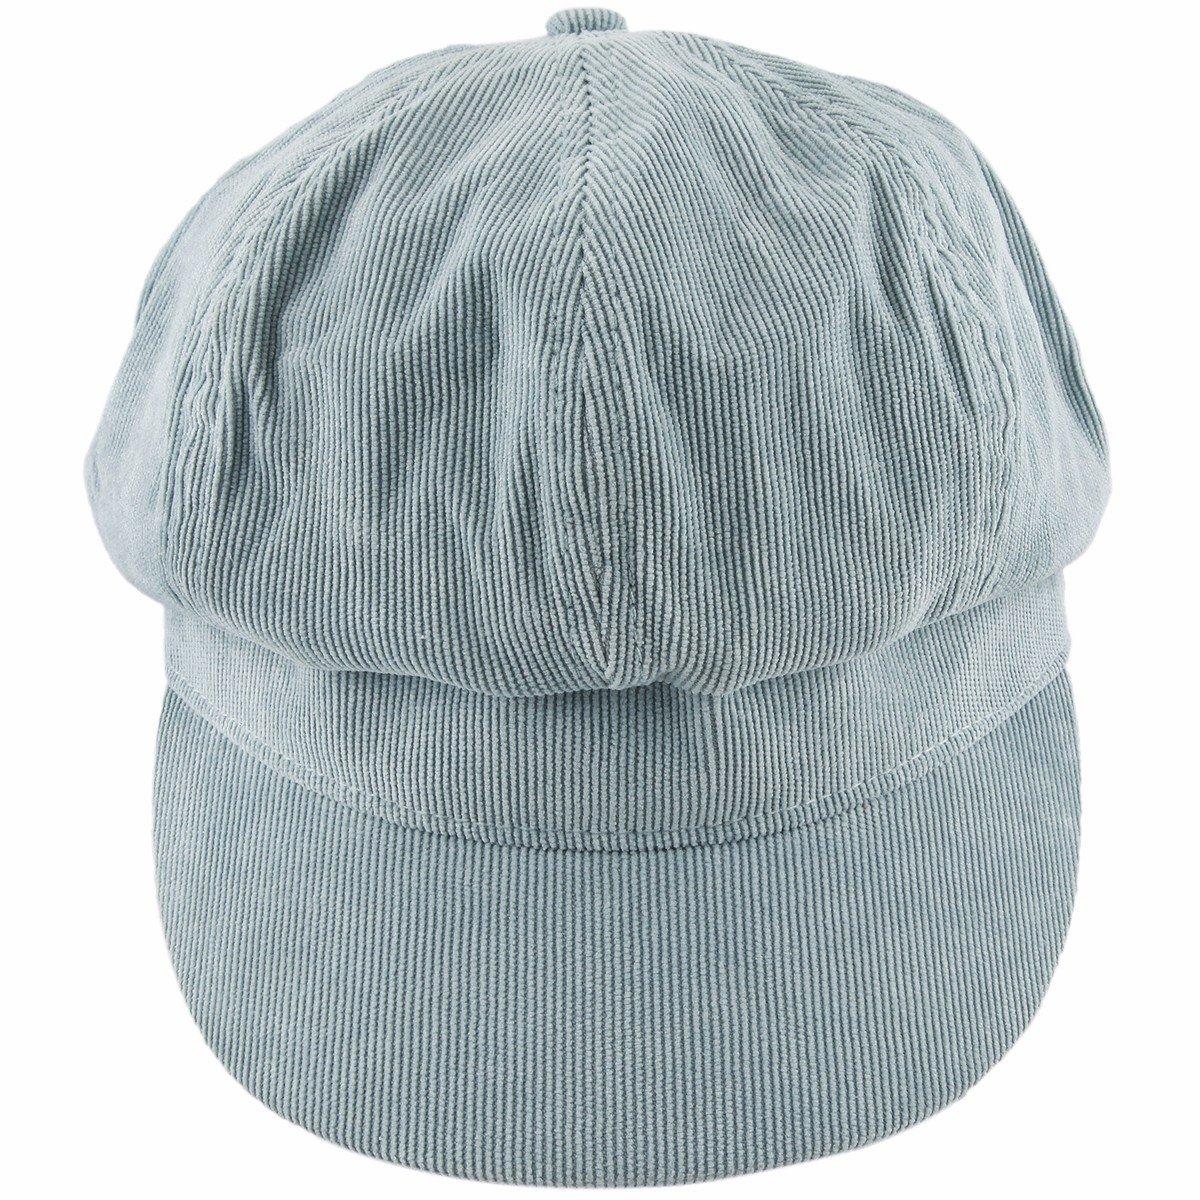 Samtree newsboy Cap For Women,8 Panel IVY Cabbie Beret Visor Brim Hat AM0503-1